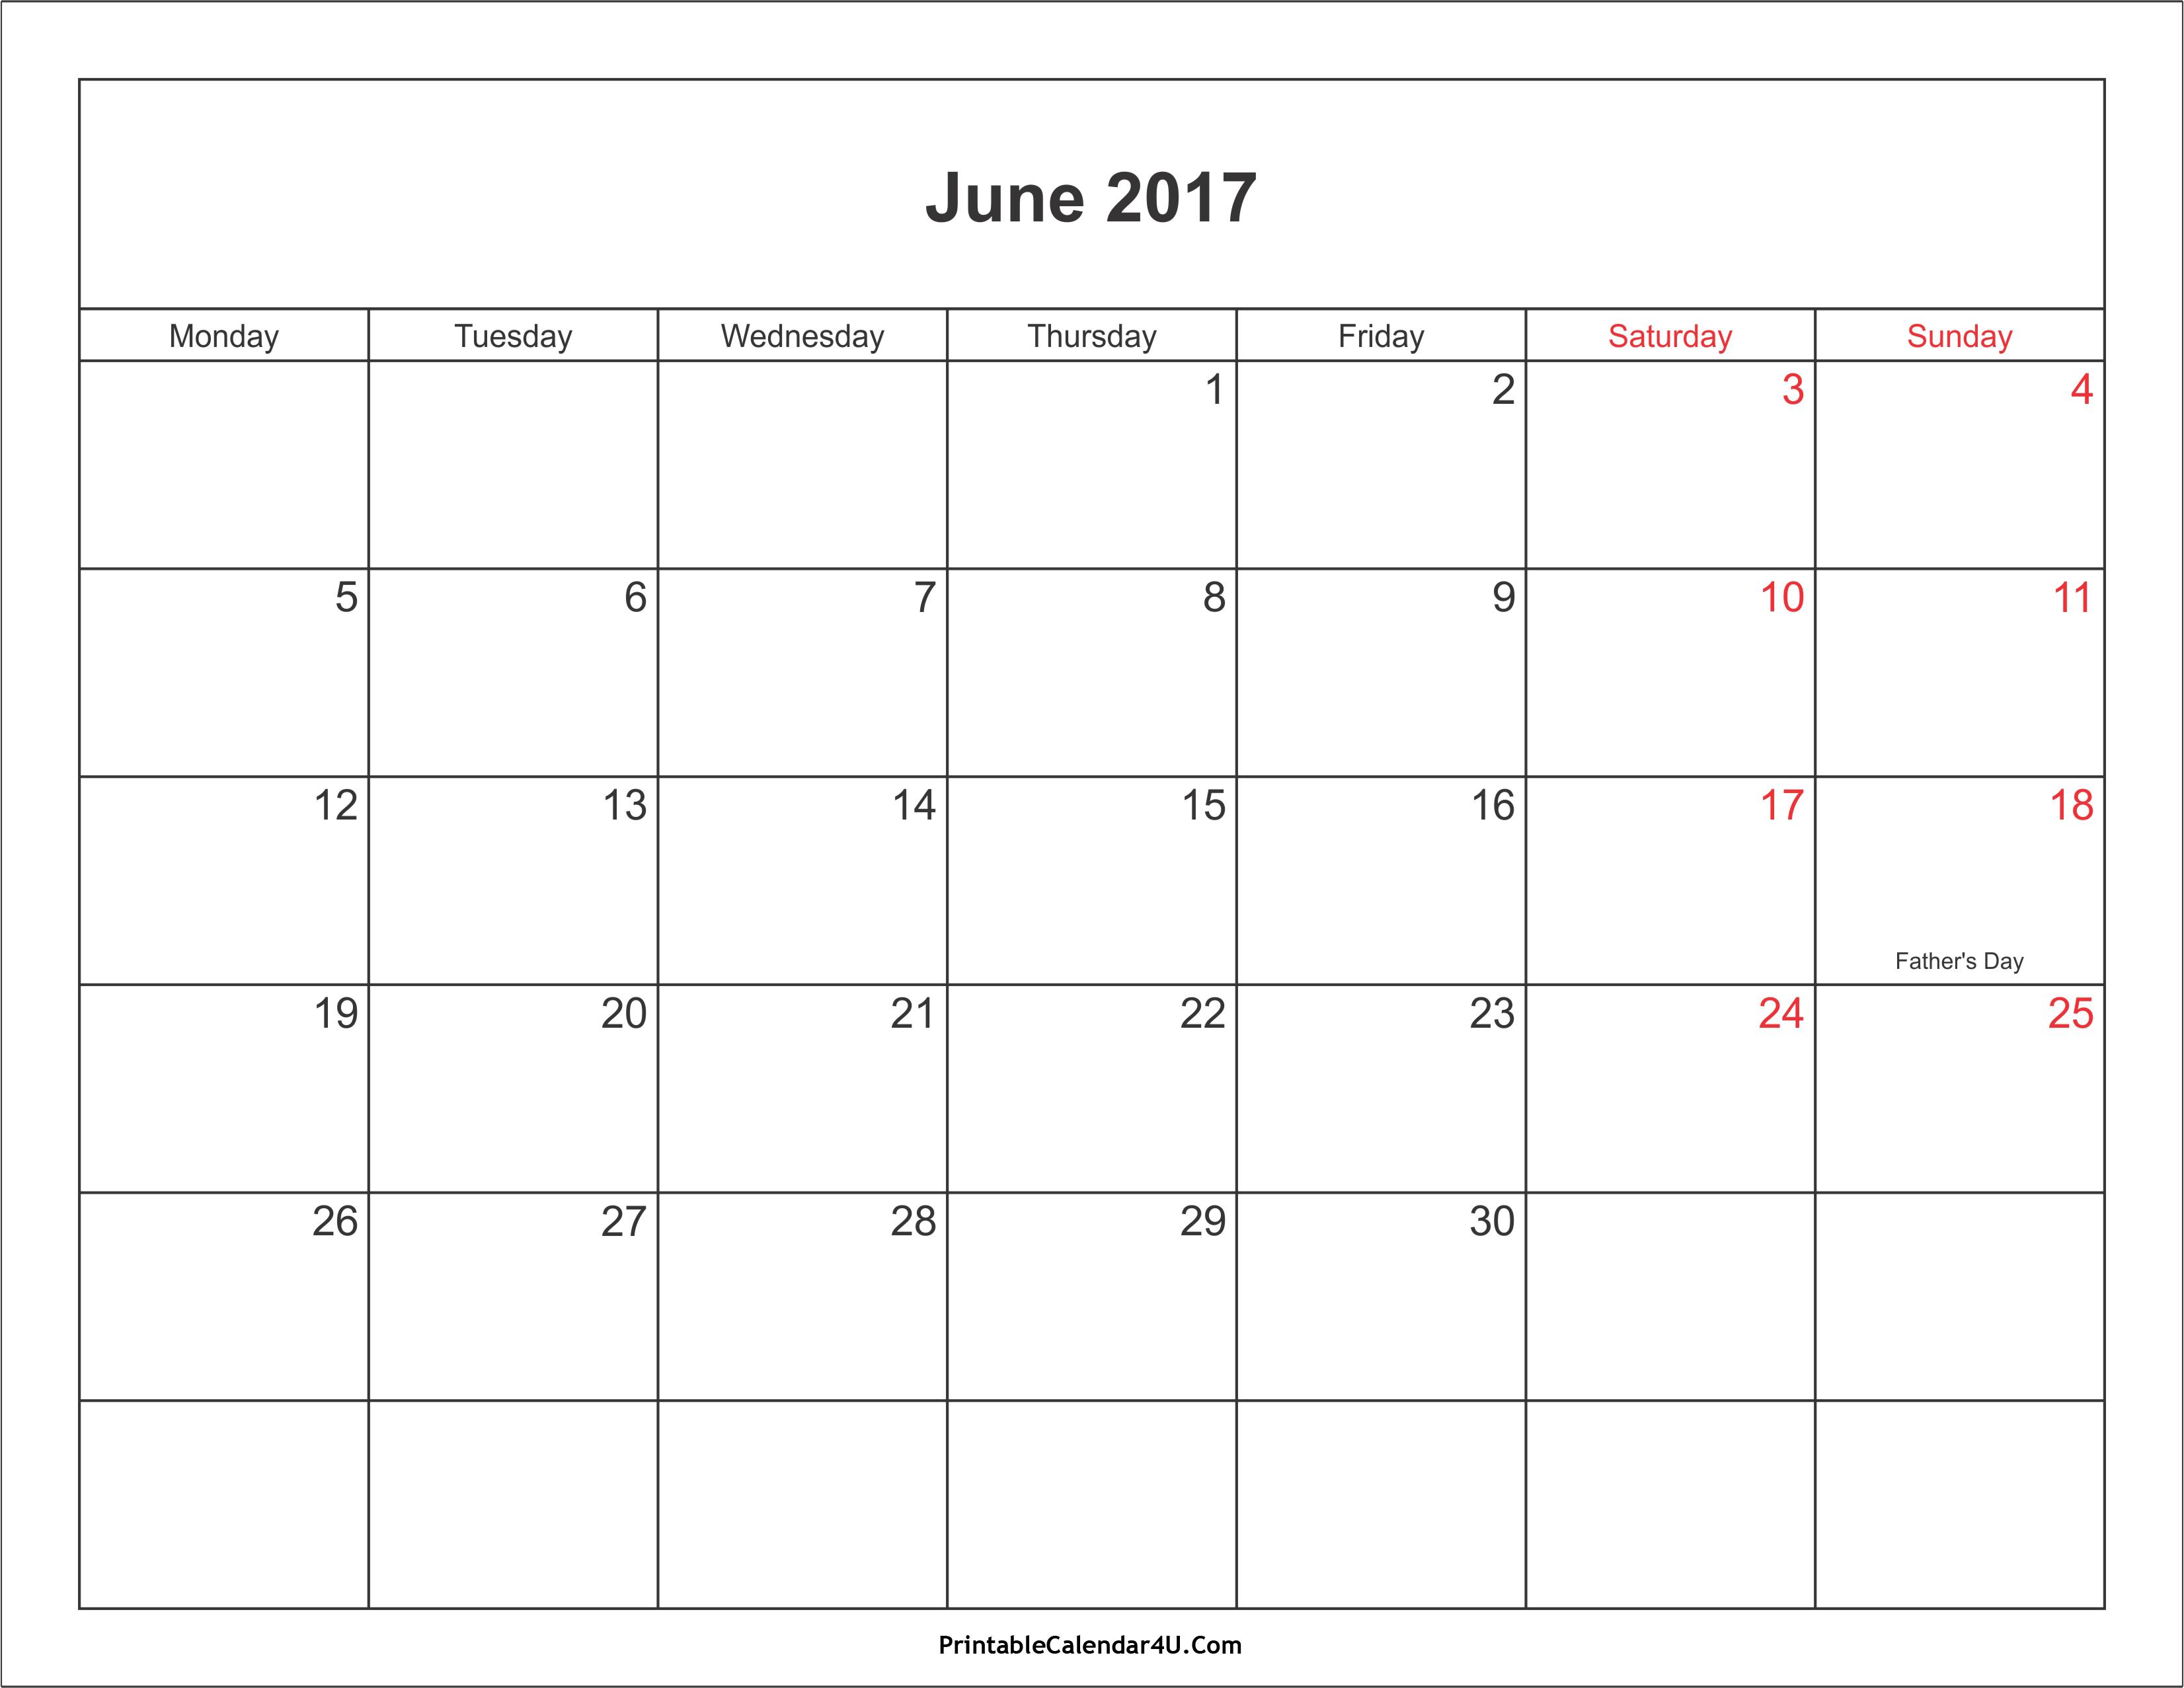 June 2017 Calendar With Holidays | weekly calendar template